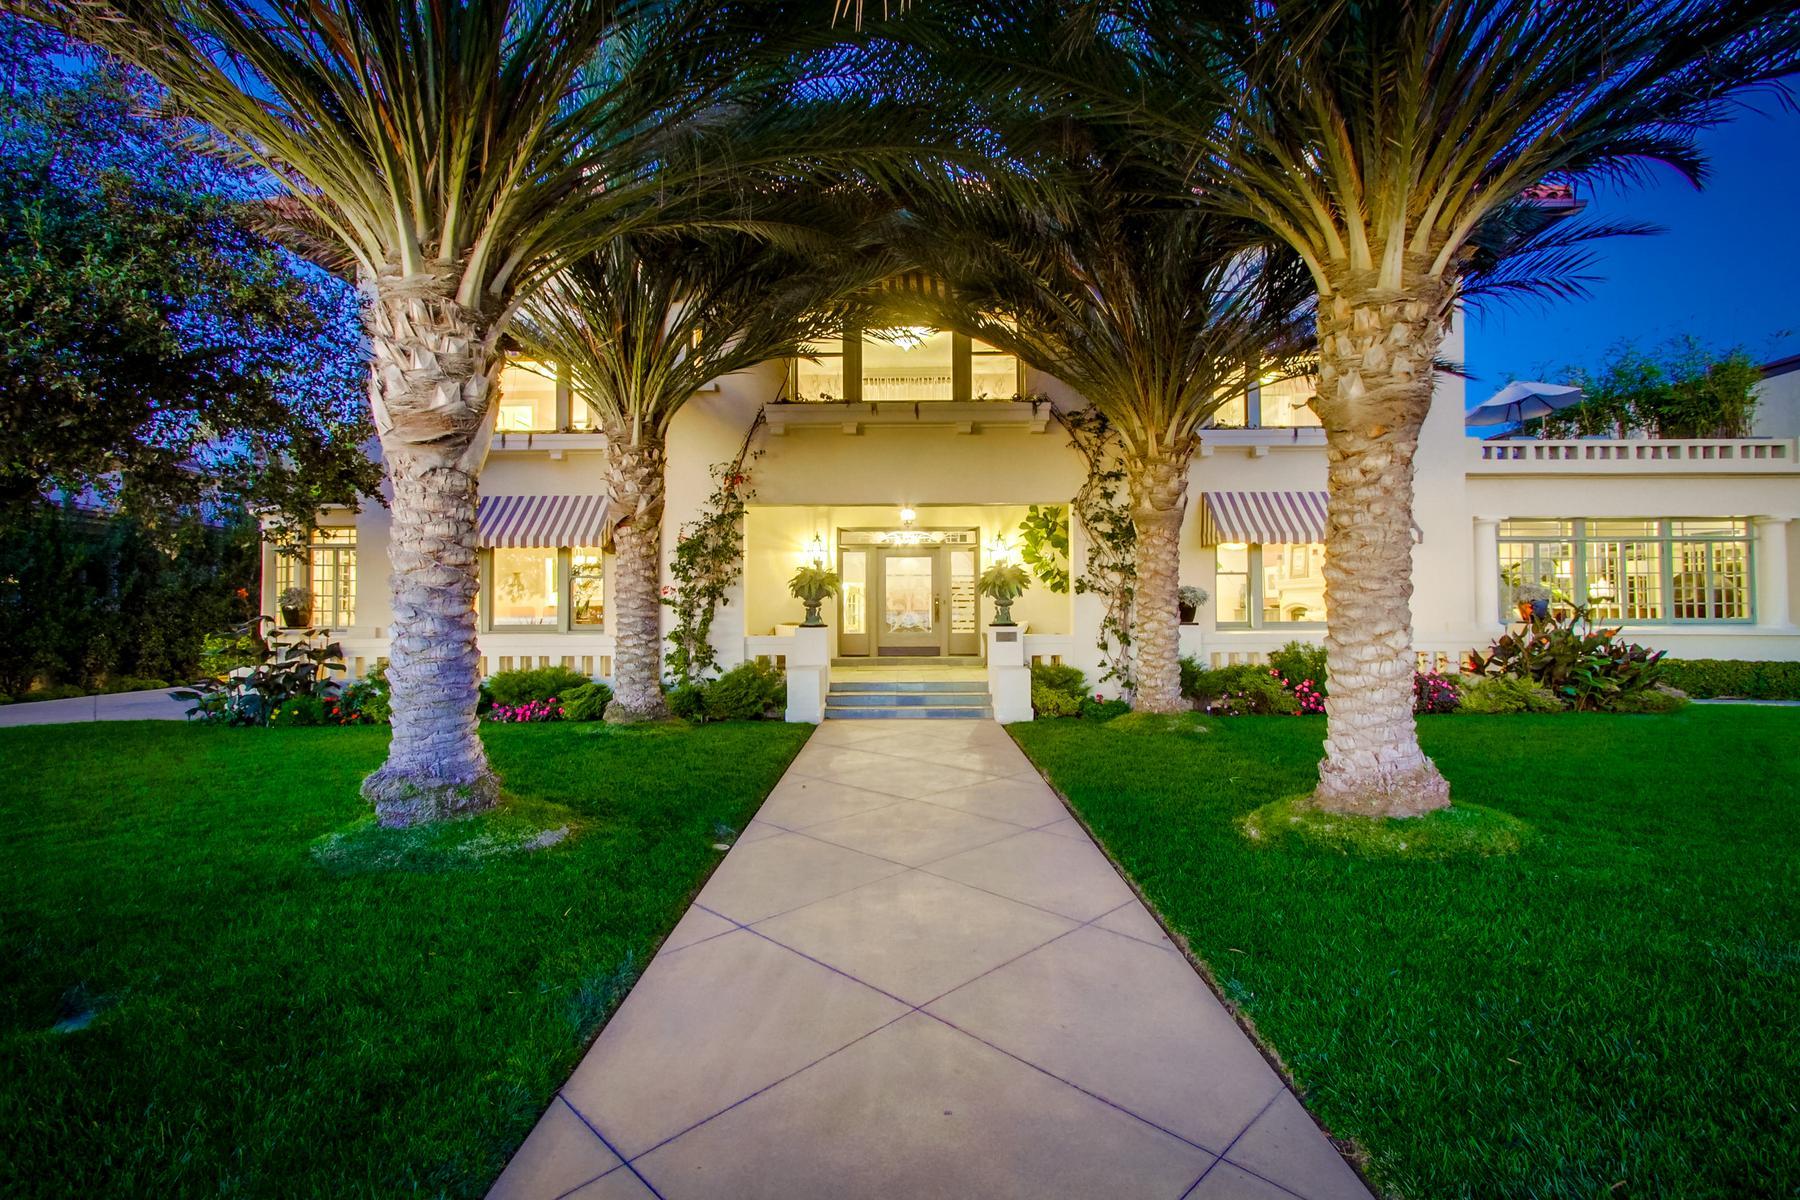 Moradia para Venda às 1043 Ocean Boulevard Coronado, Califórnia, 92118 Estados Unidos